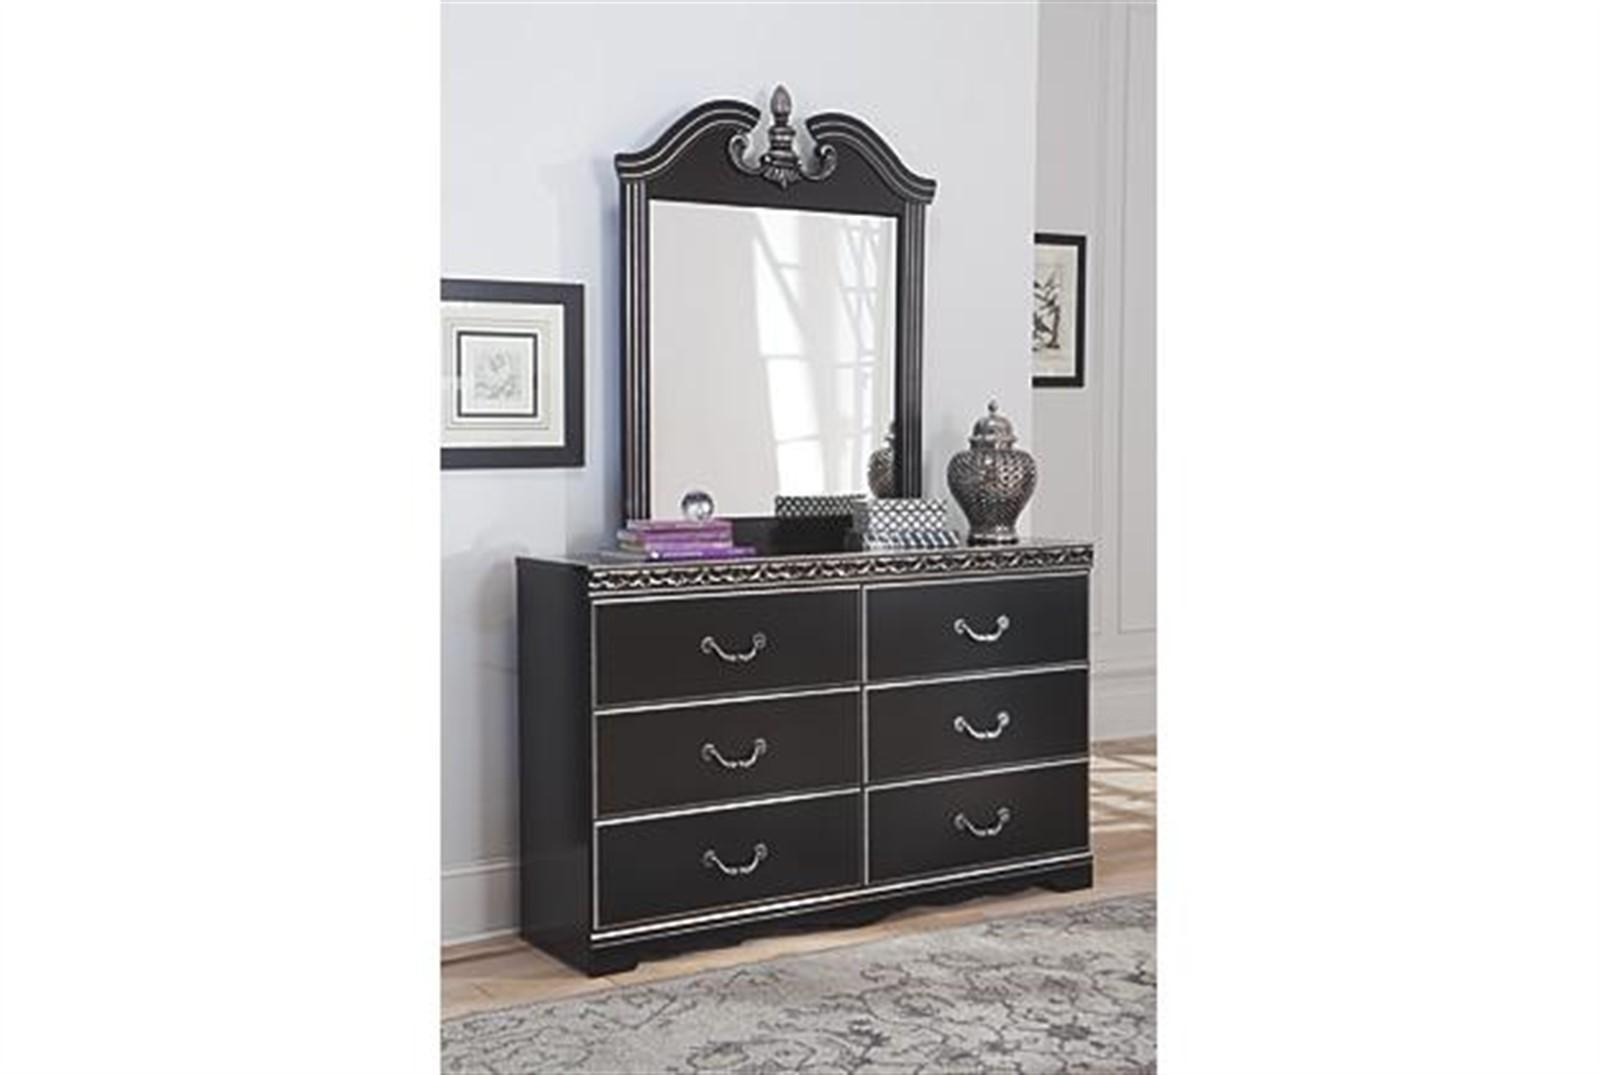 Navoni Dresser and Mirror Set - Black